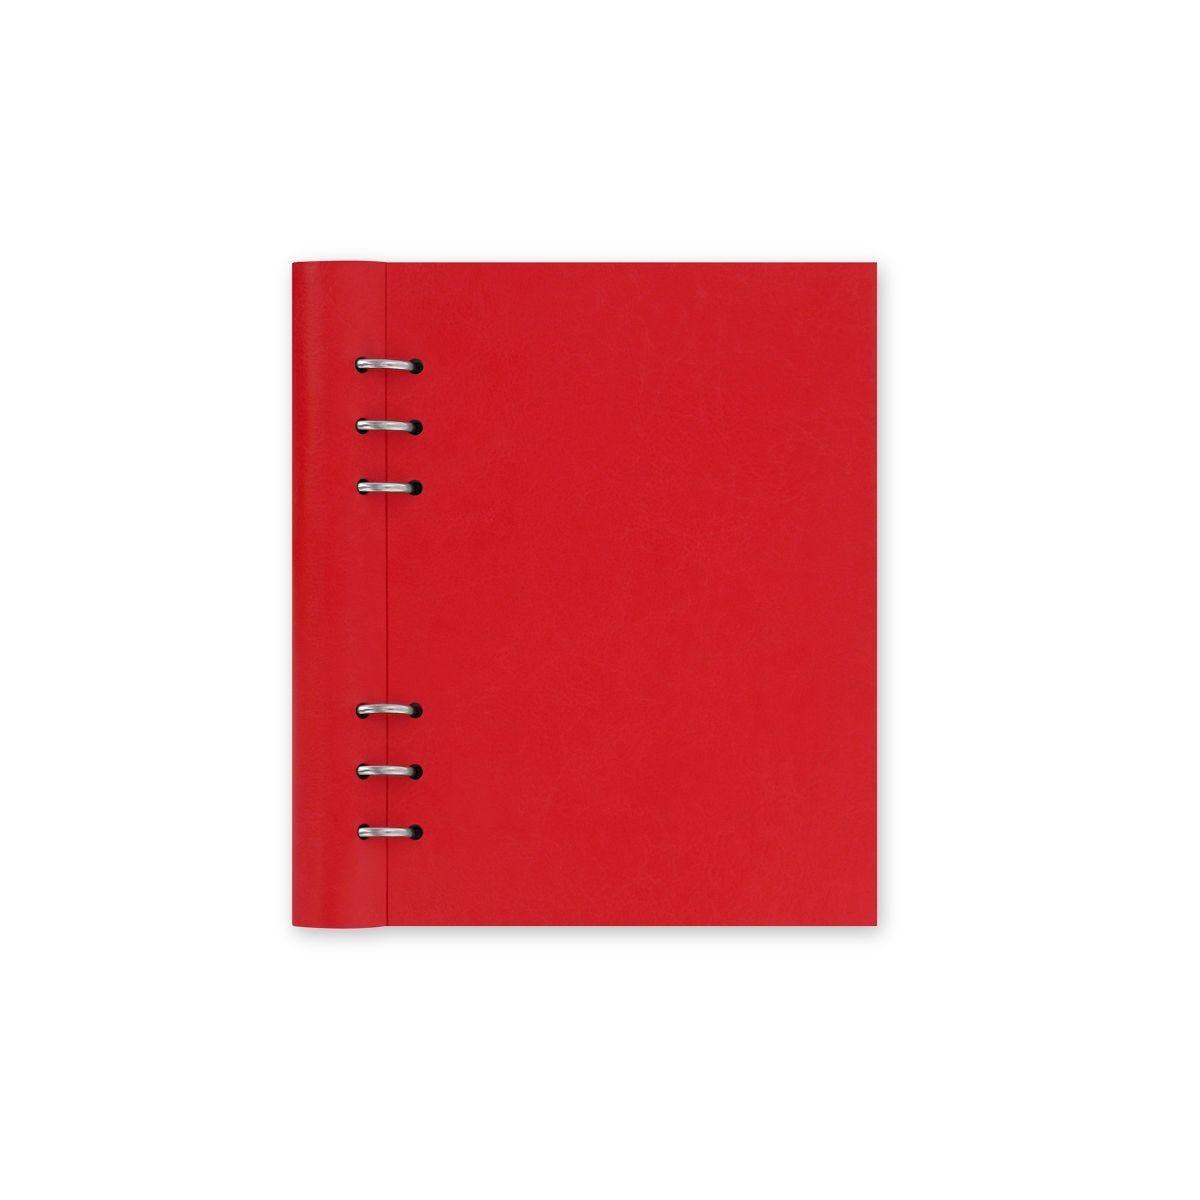 Filofax Refillable Clipbook Planner A5 Poppy